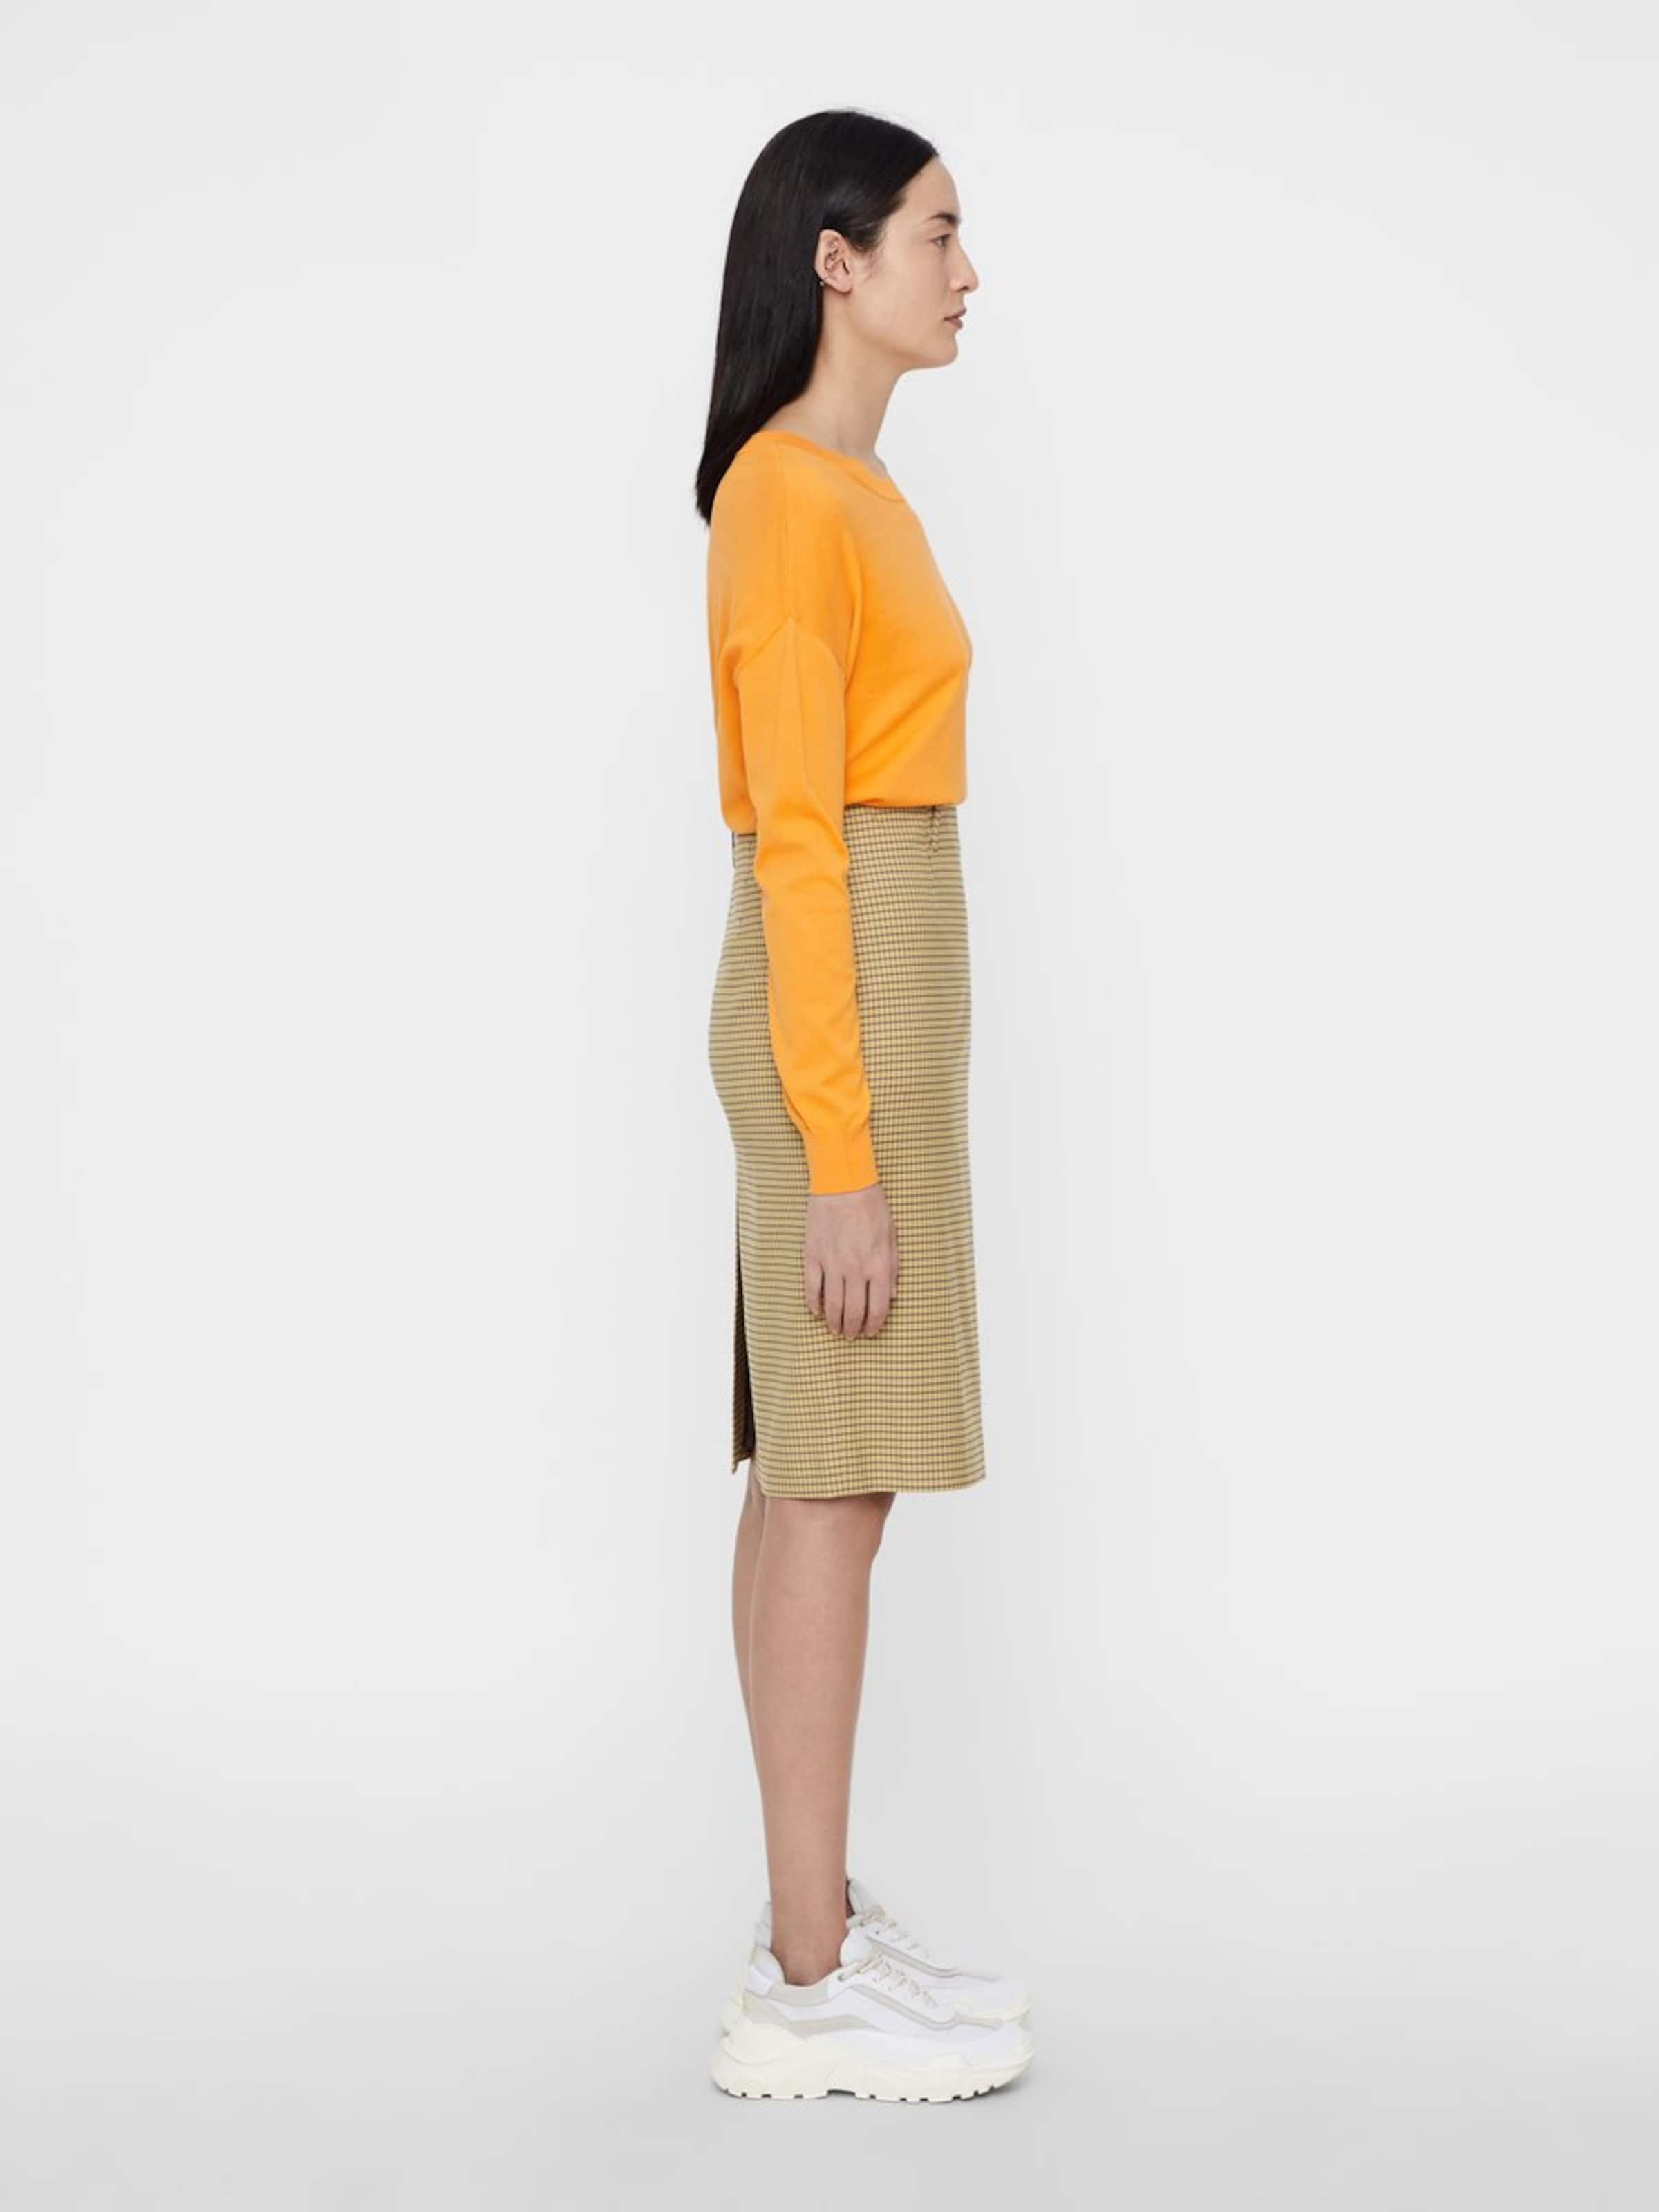 Pullover In lindeberg Mandarine J 'marion' Xn0P8wOk